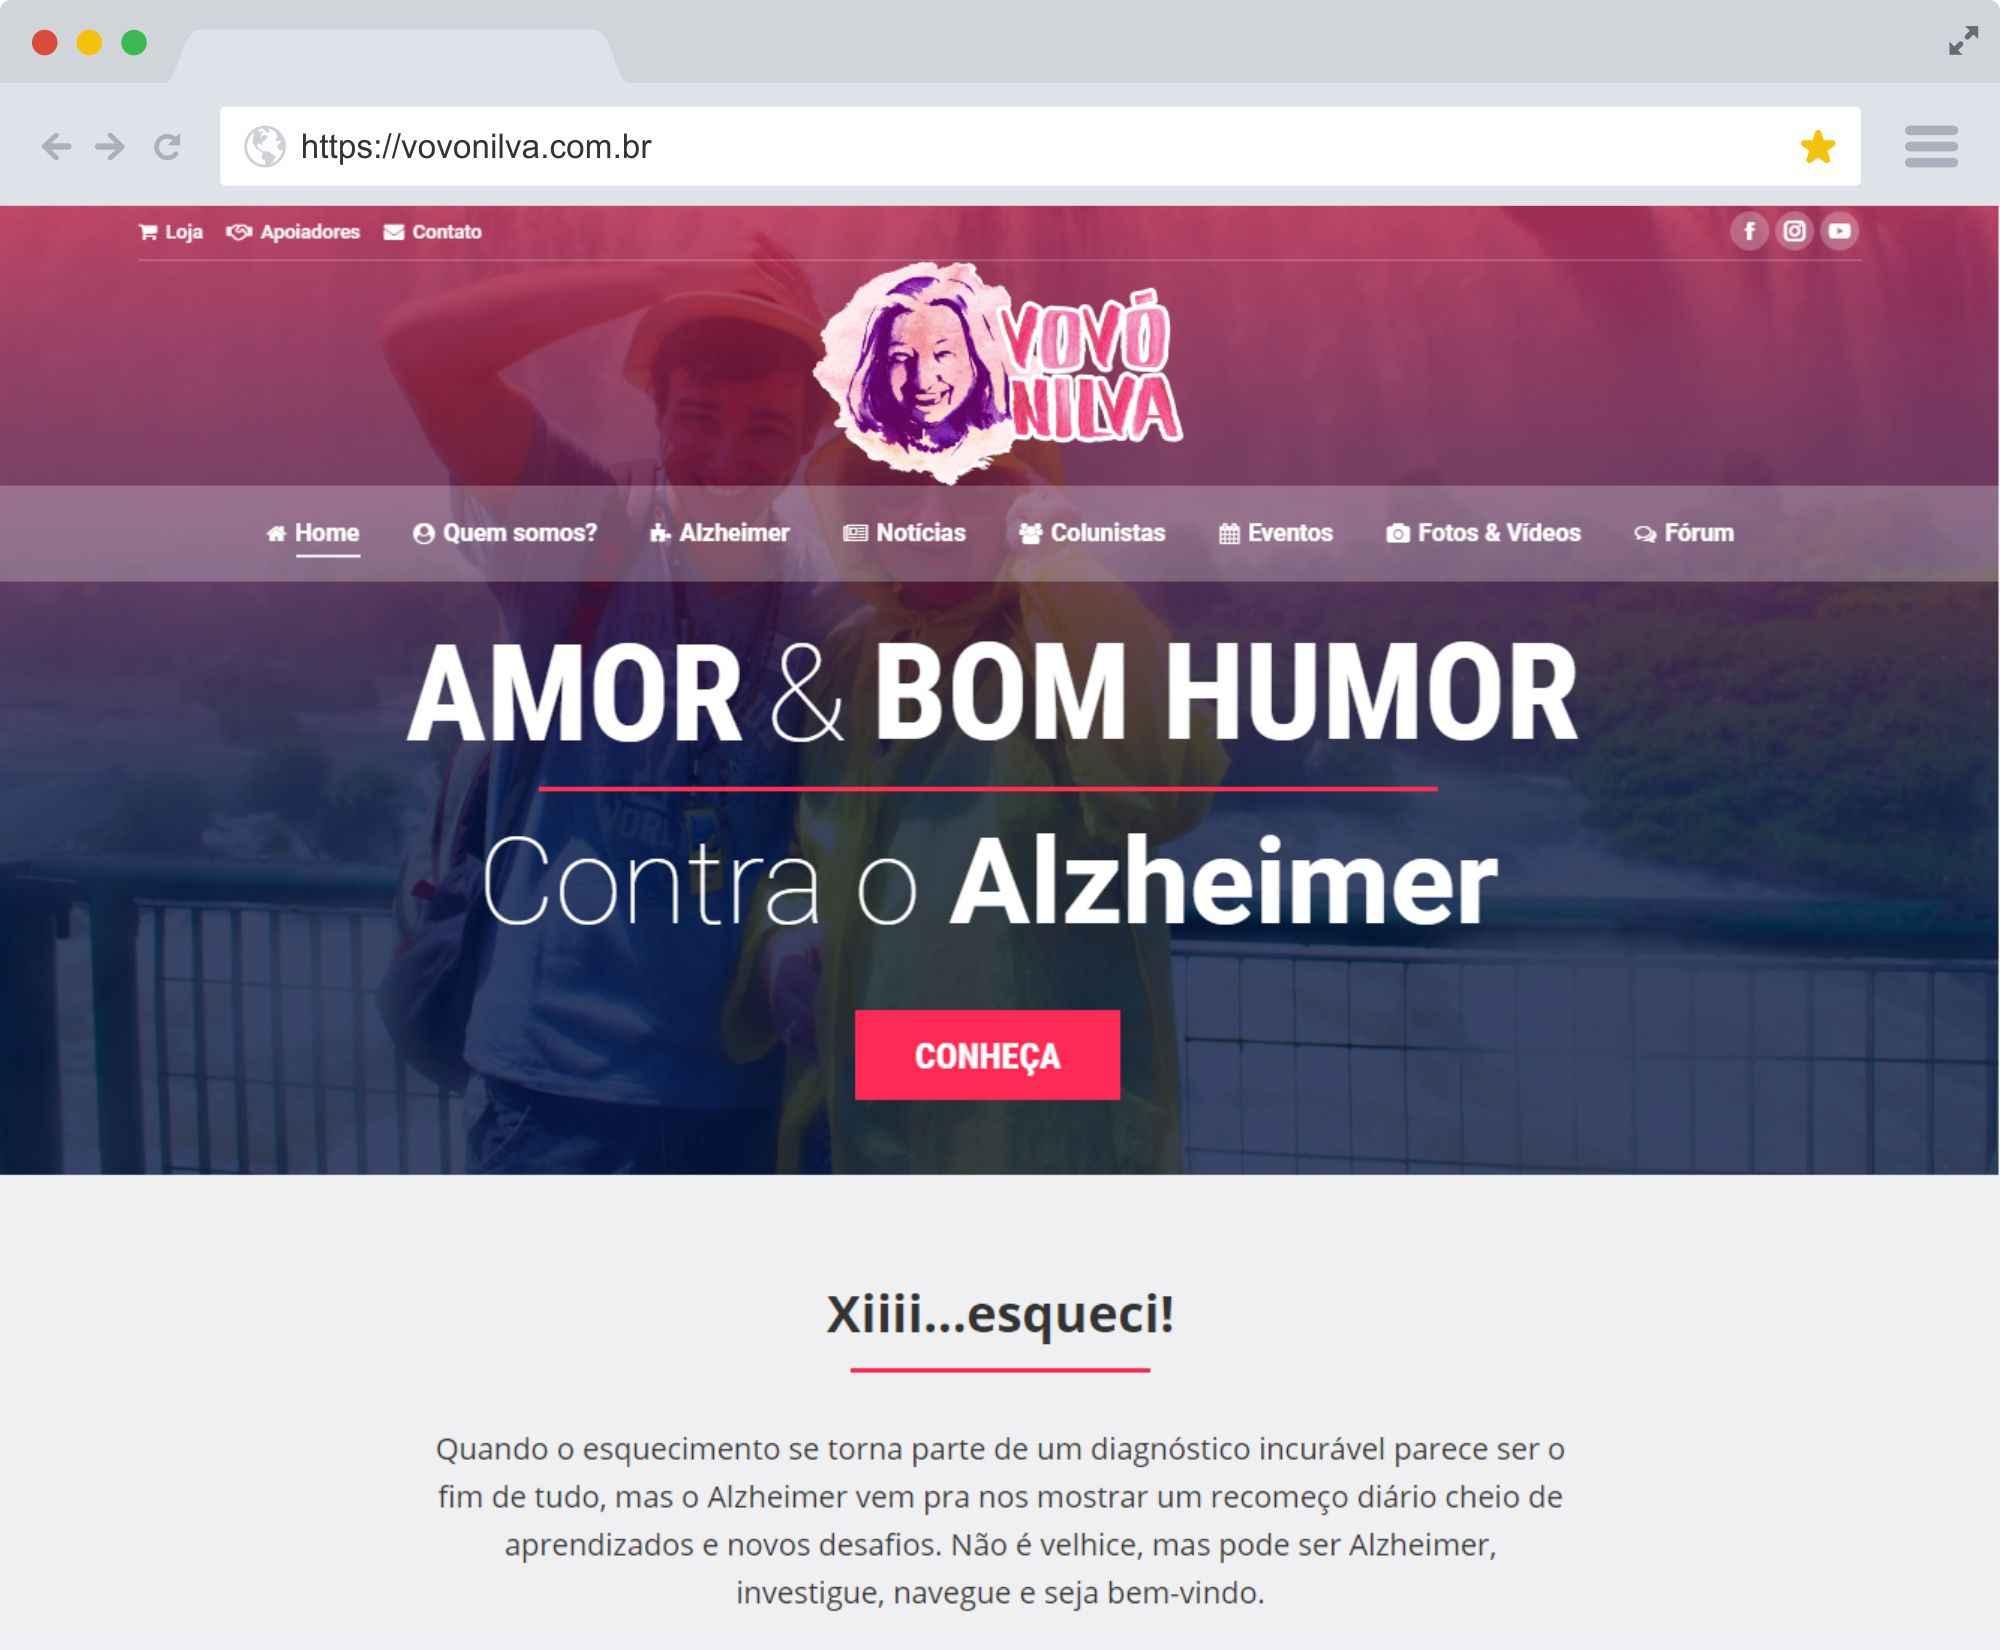 vovonilva.com.br